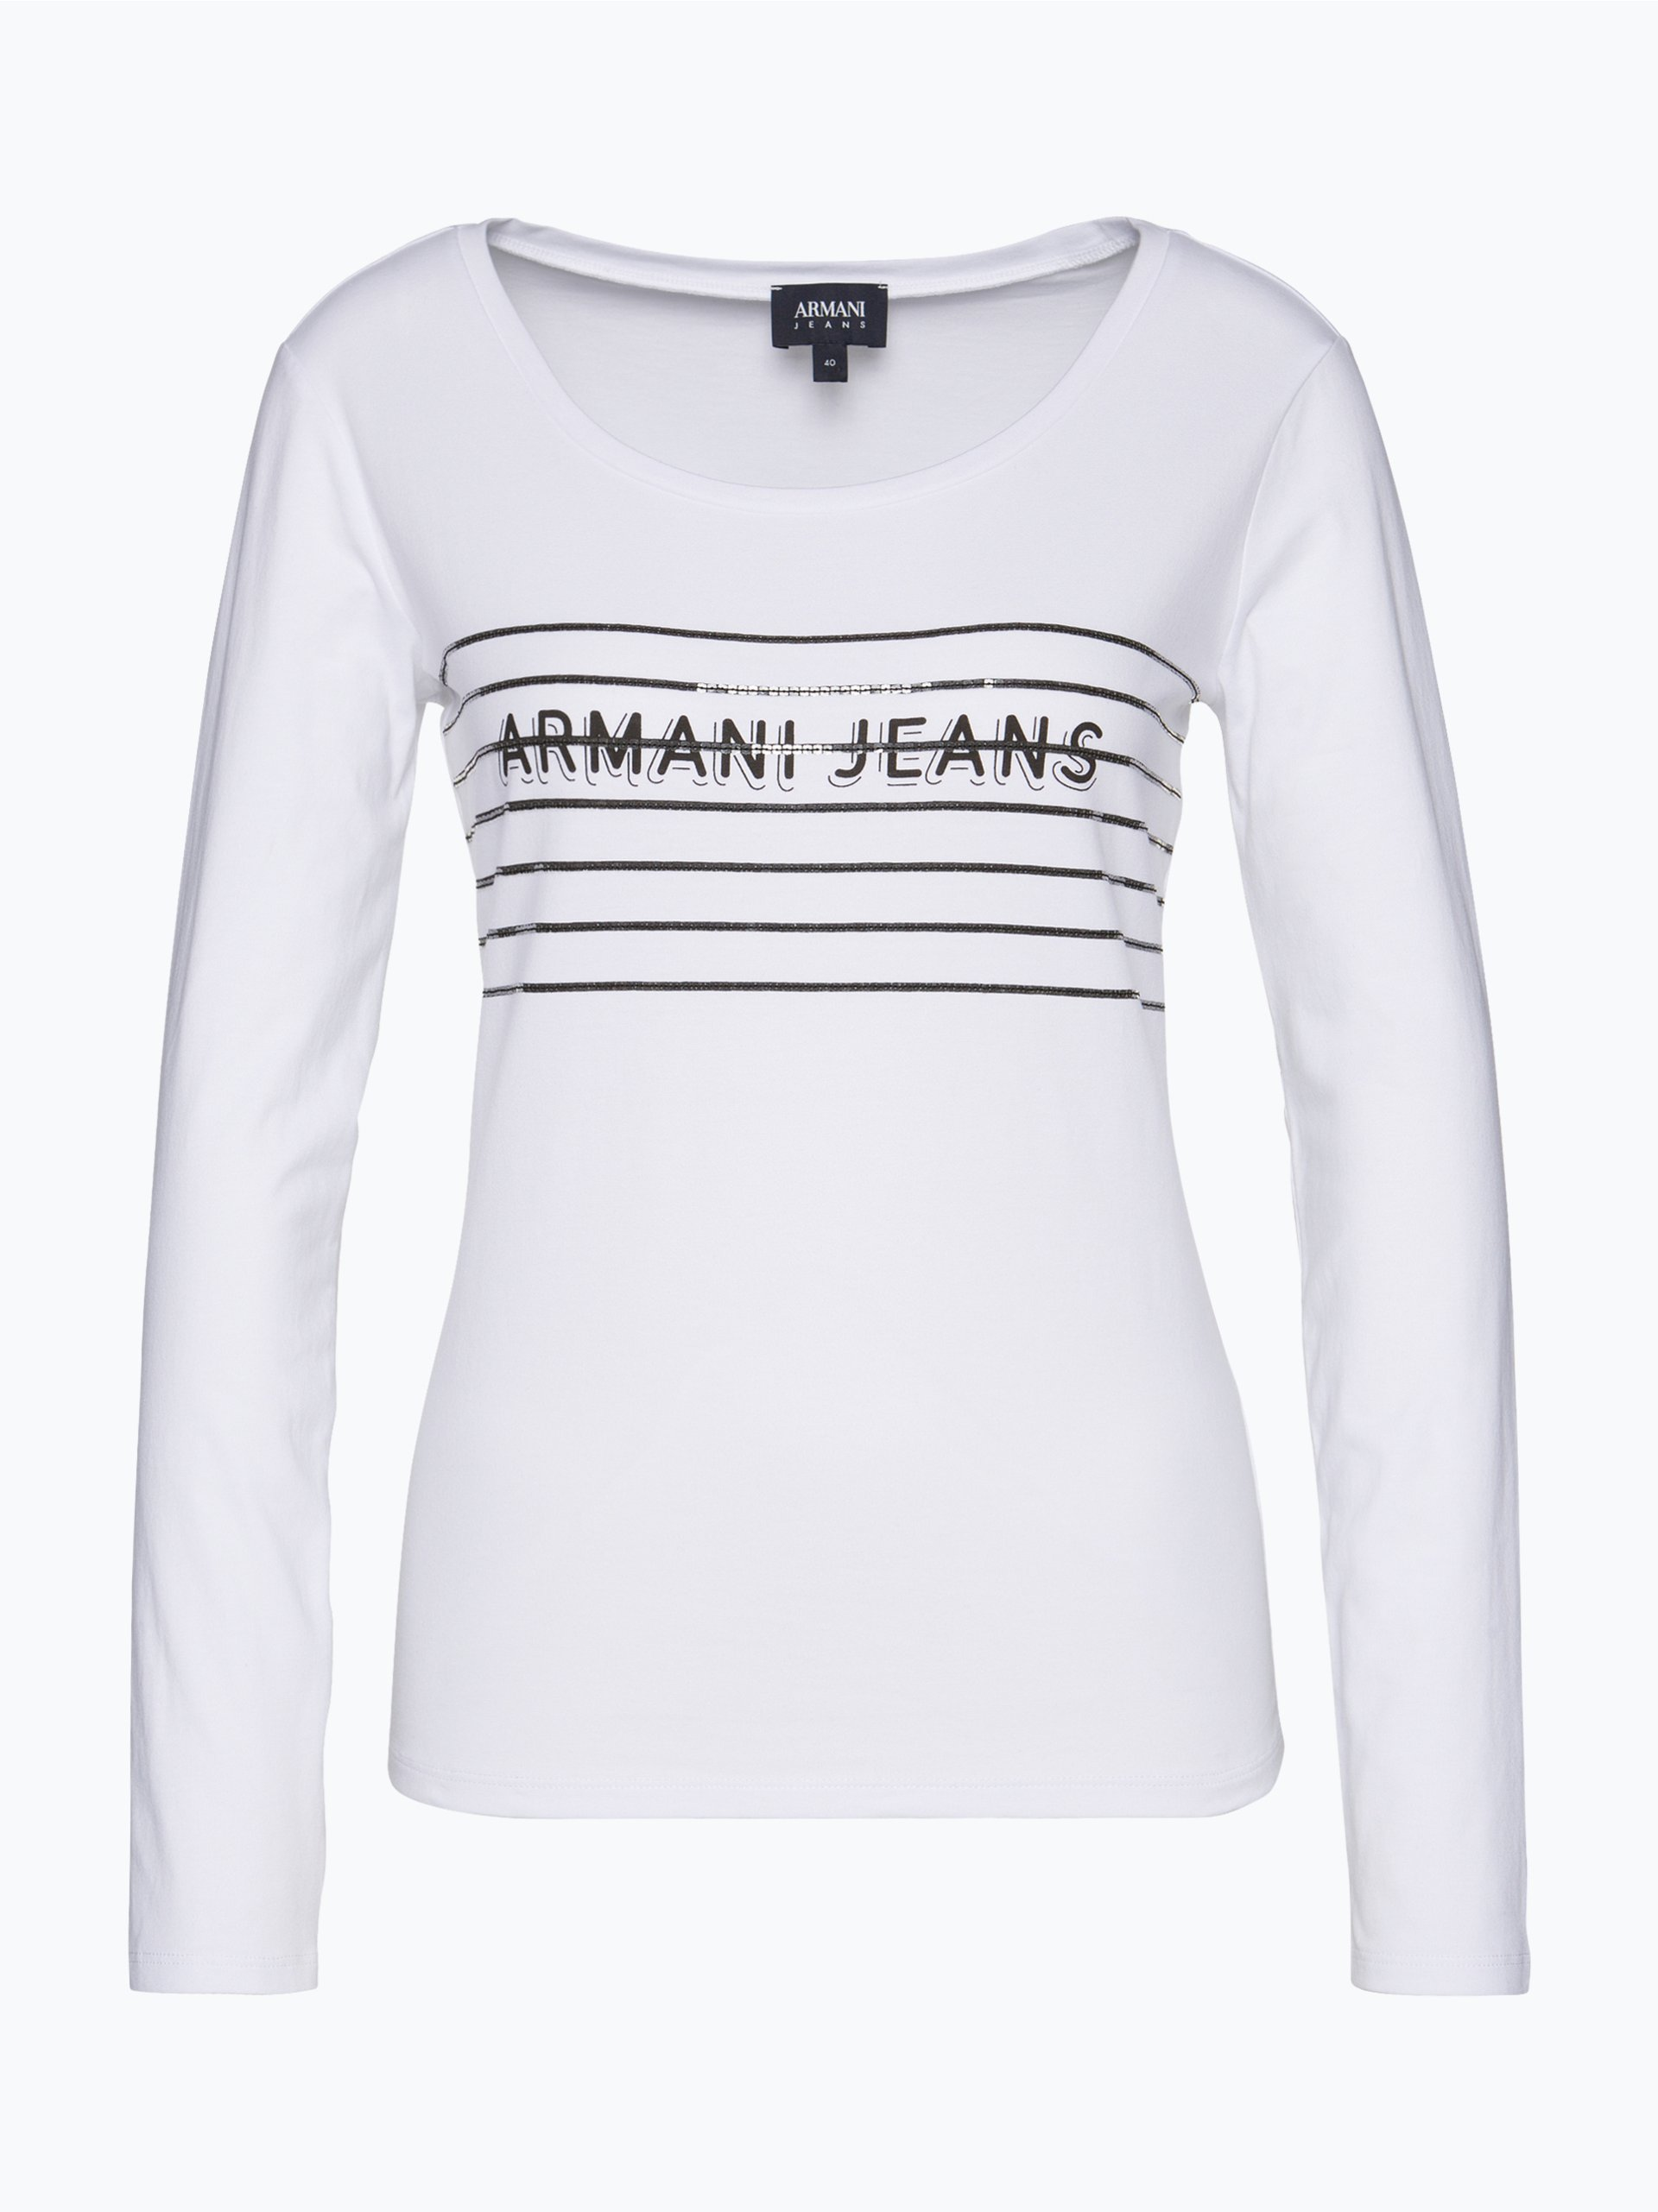 armani jeans damen langarmshirt wei gemustert online. Black Bedroom Furniture Sets. Home Design Ideas